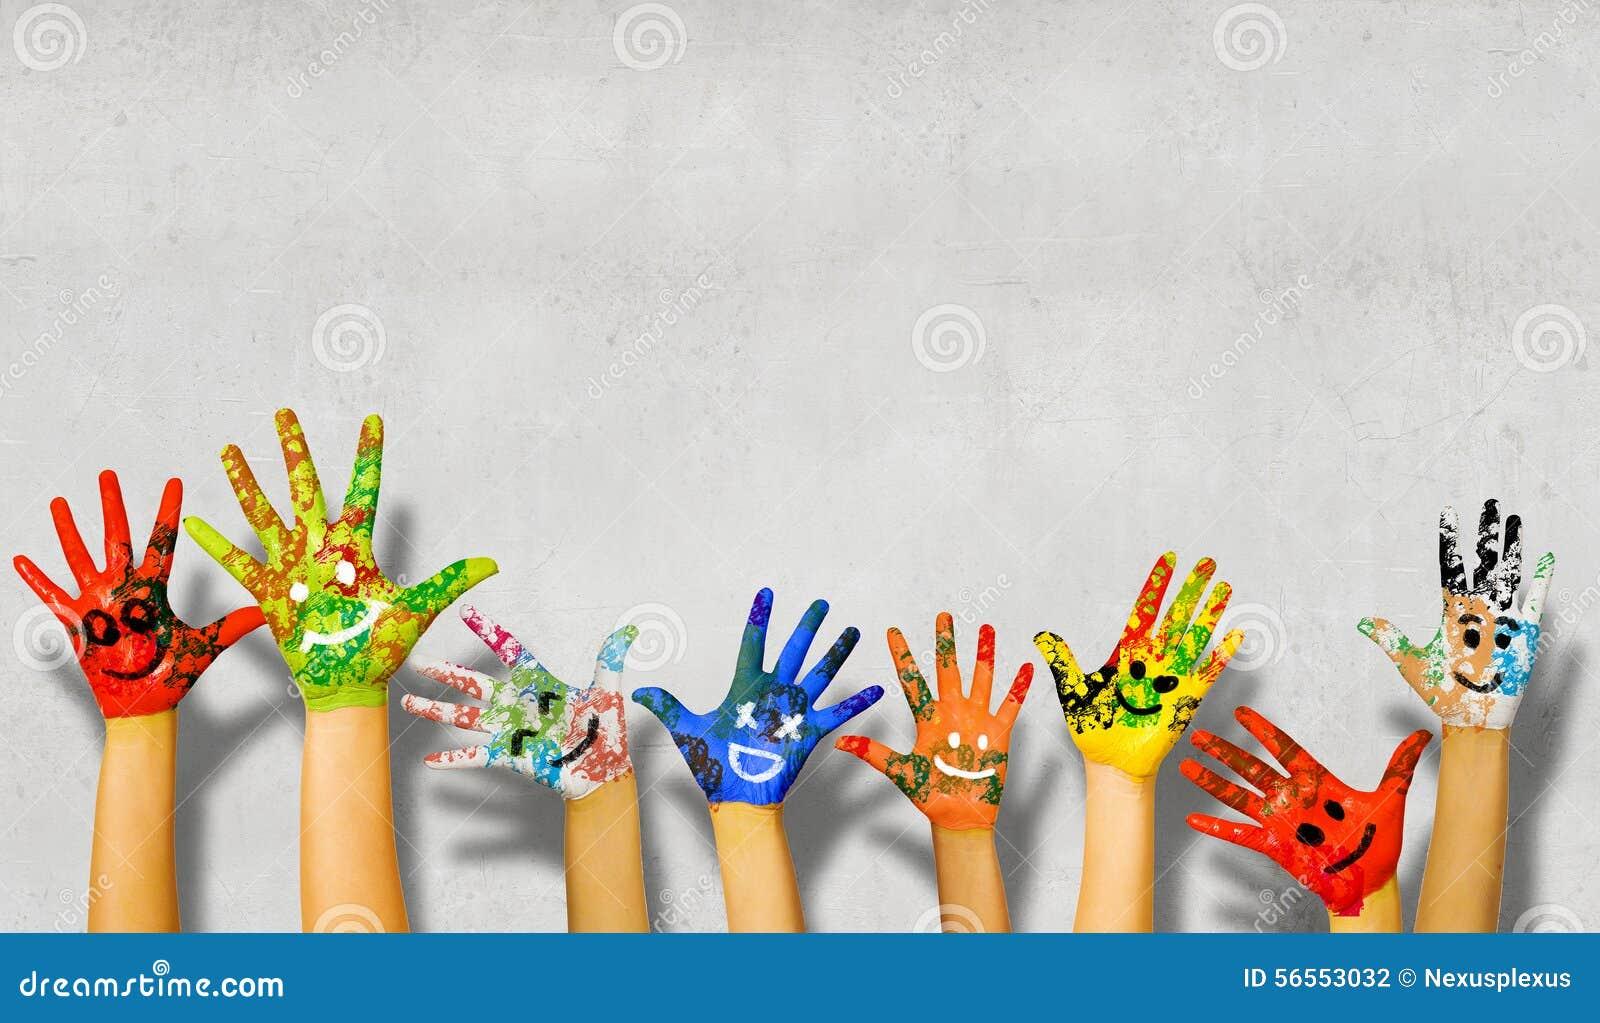 Download Προσθέστε το χρώμα στη ζωή στοκ εικόνες. εικόνα από αστείος - 56553032